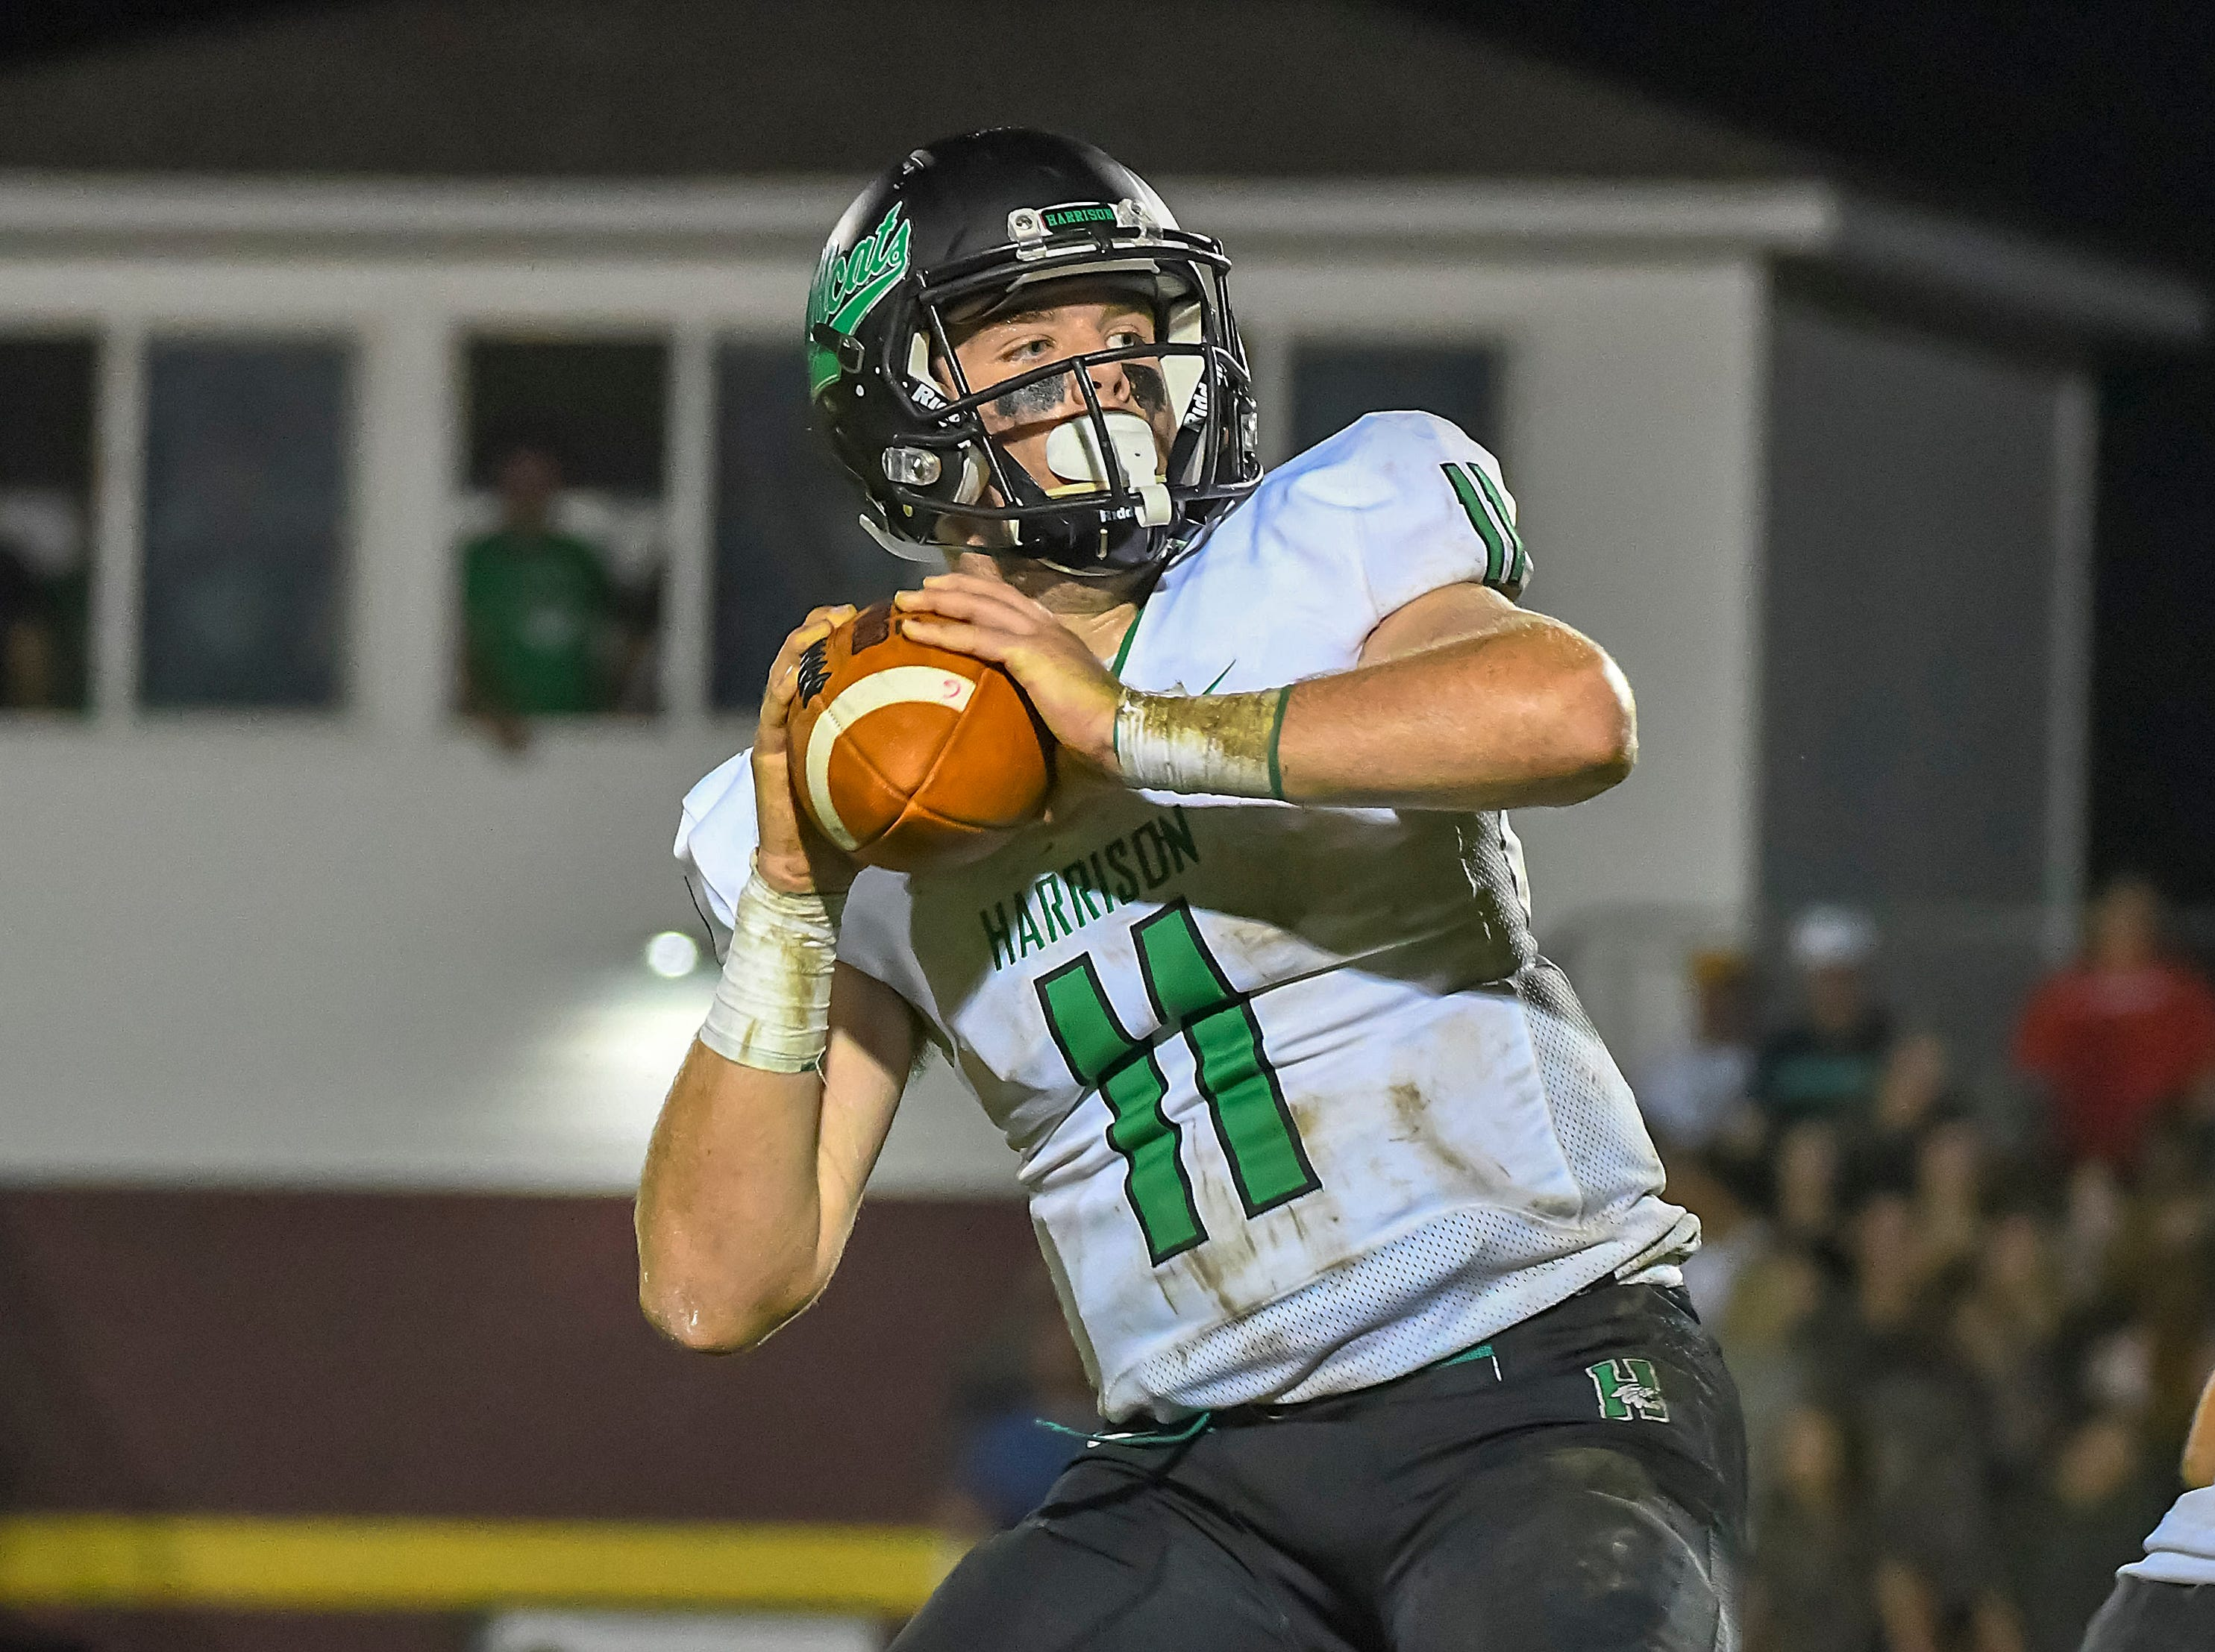 Connor Kinnett of Harrison attempts a pass against Ross, Ross High School, Friday, September 14, 2018